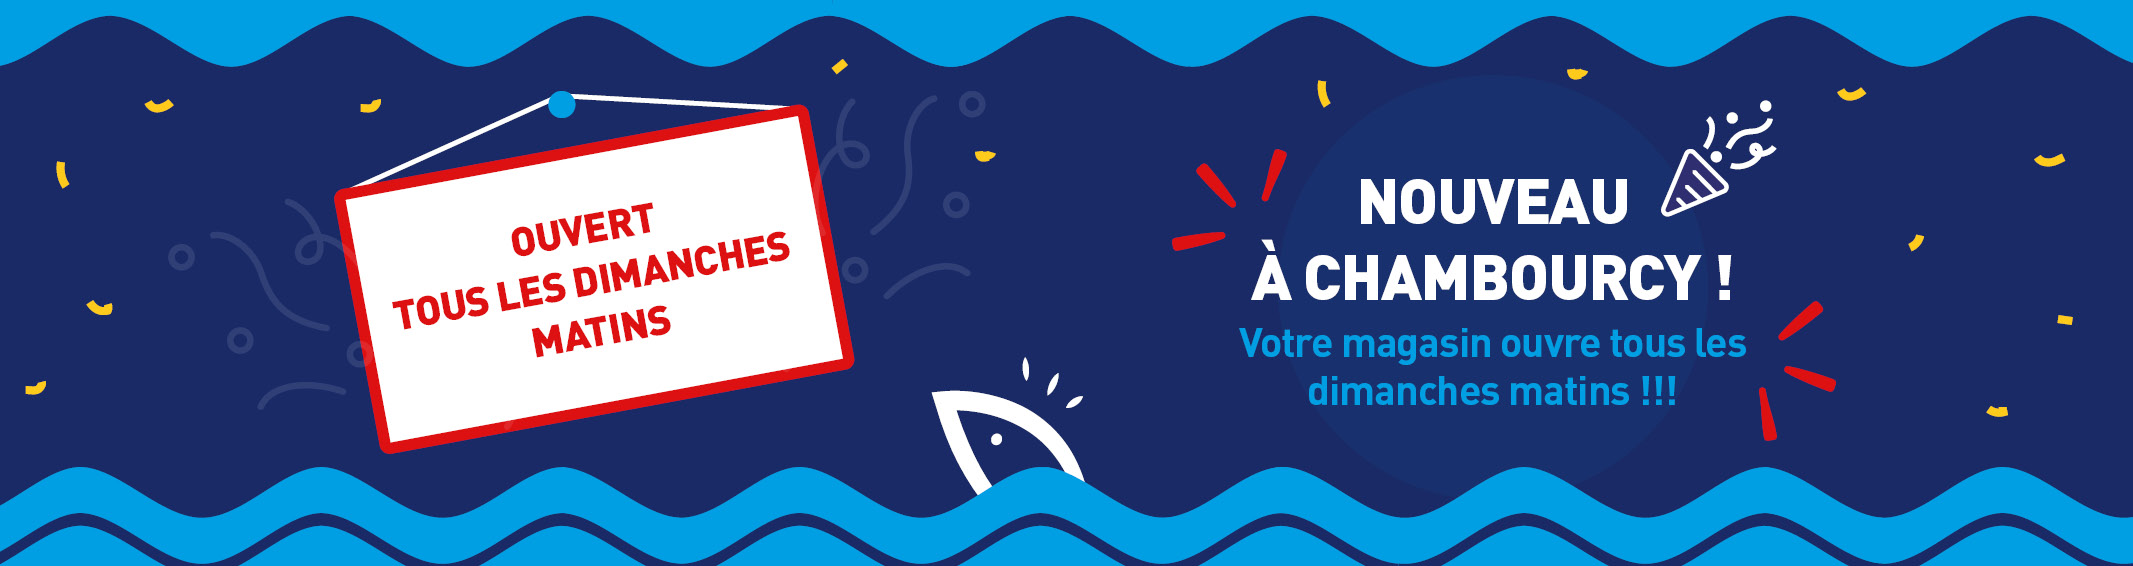 20200903_CF_Slide_Horaires_dimanche_chambourcy_2133x566px-6